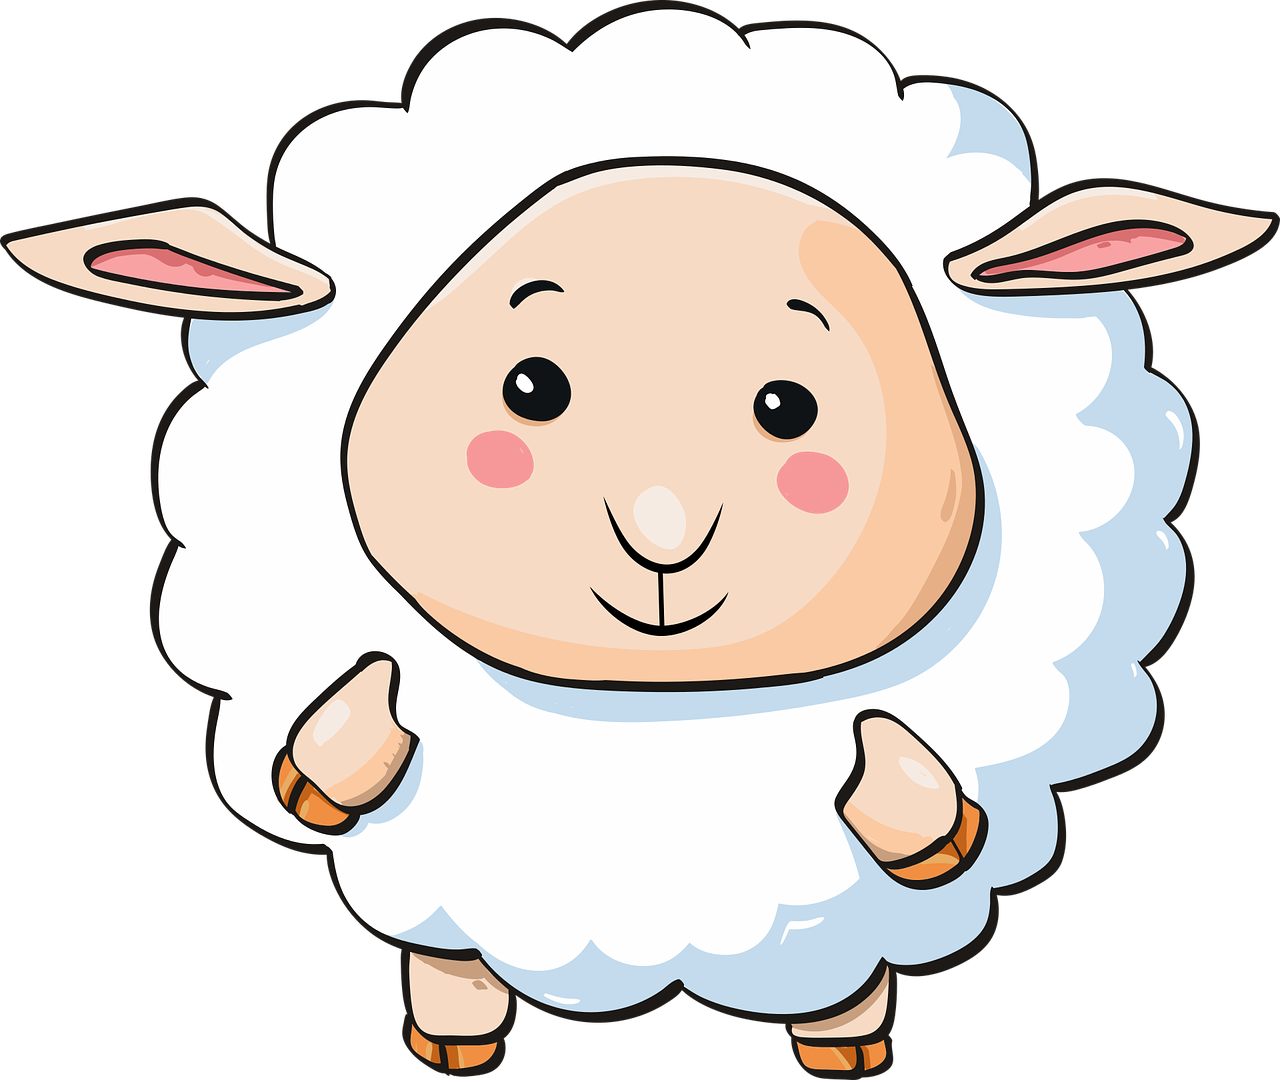 был картинки мультяшного овечки запущенных случаях липома